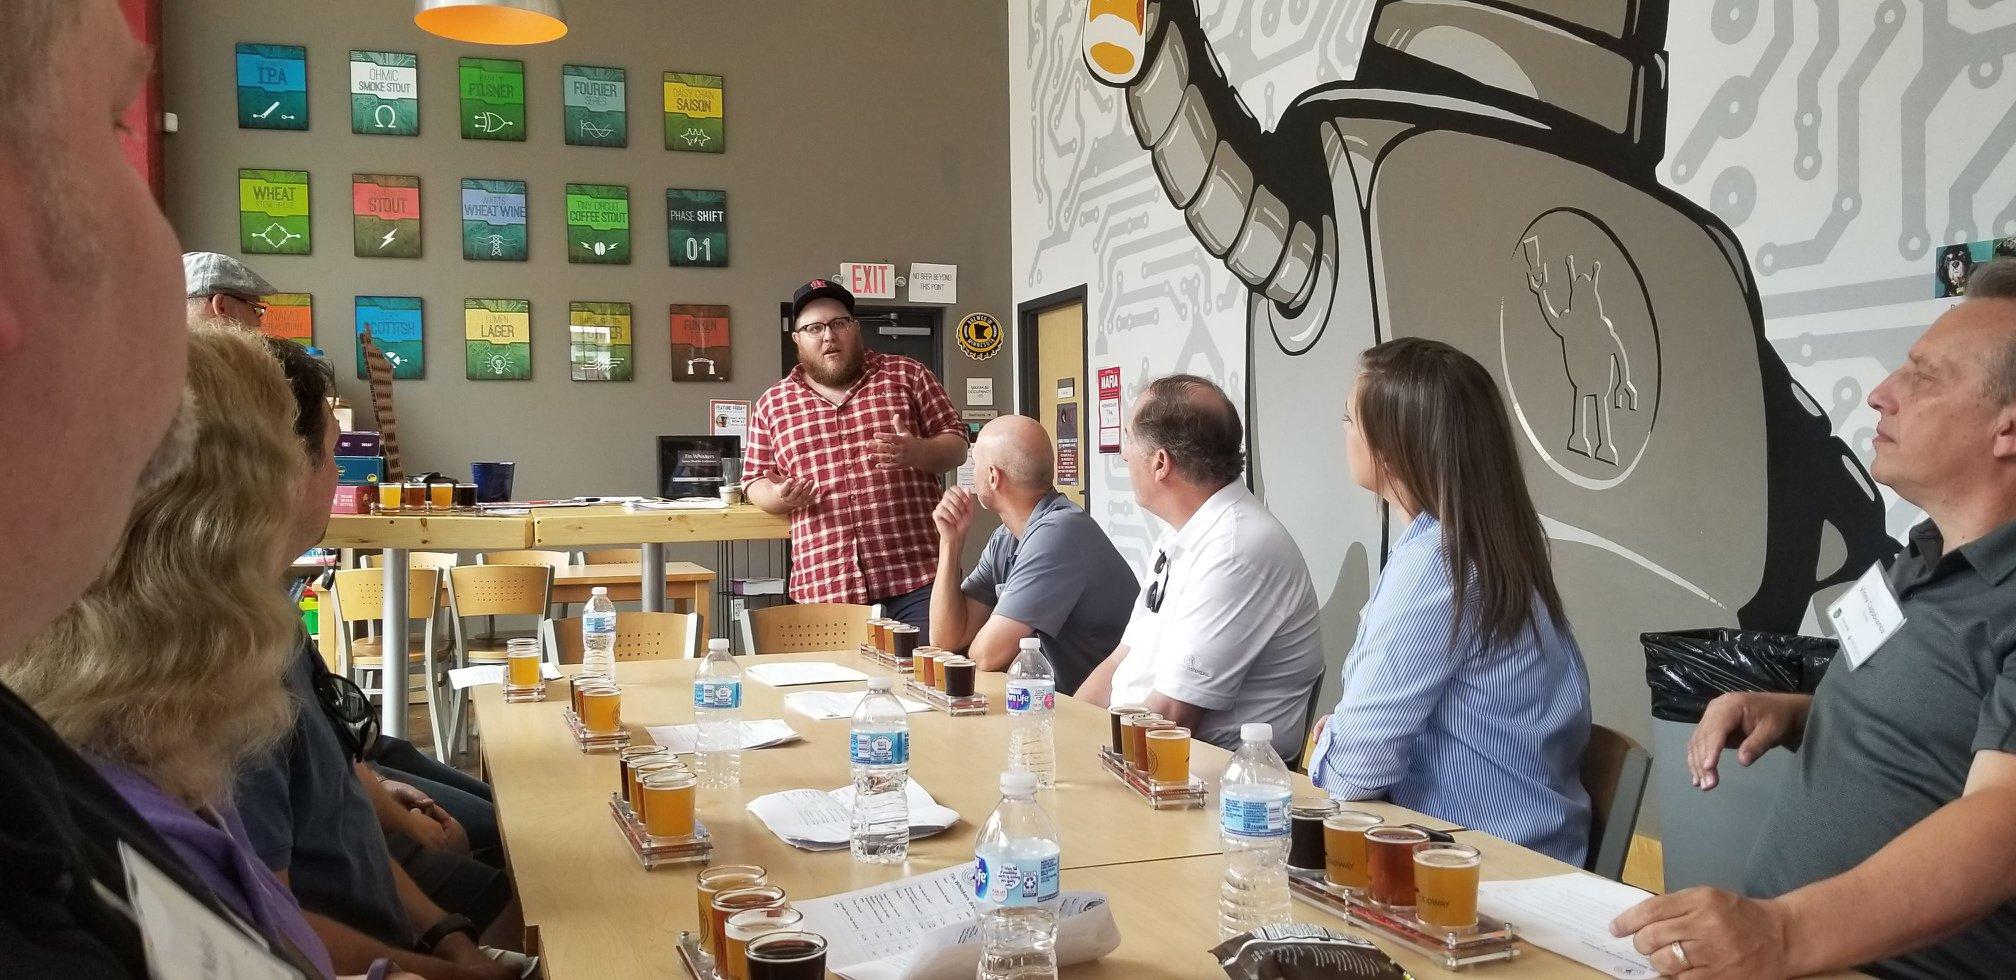 Renodis Brewery Tour